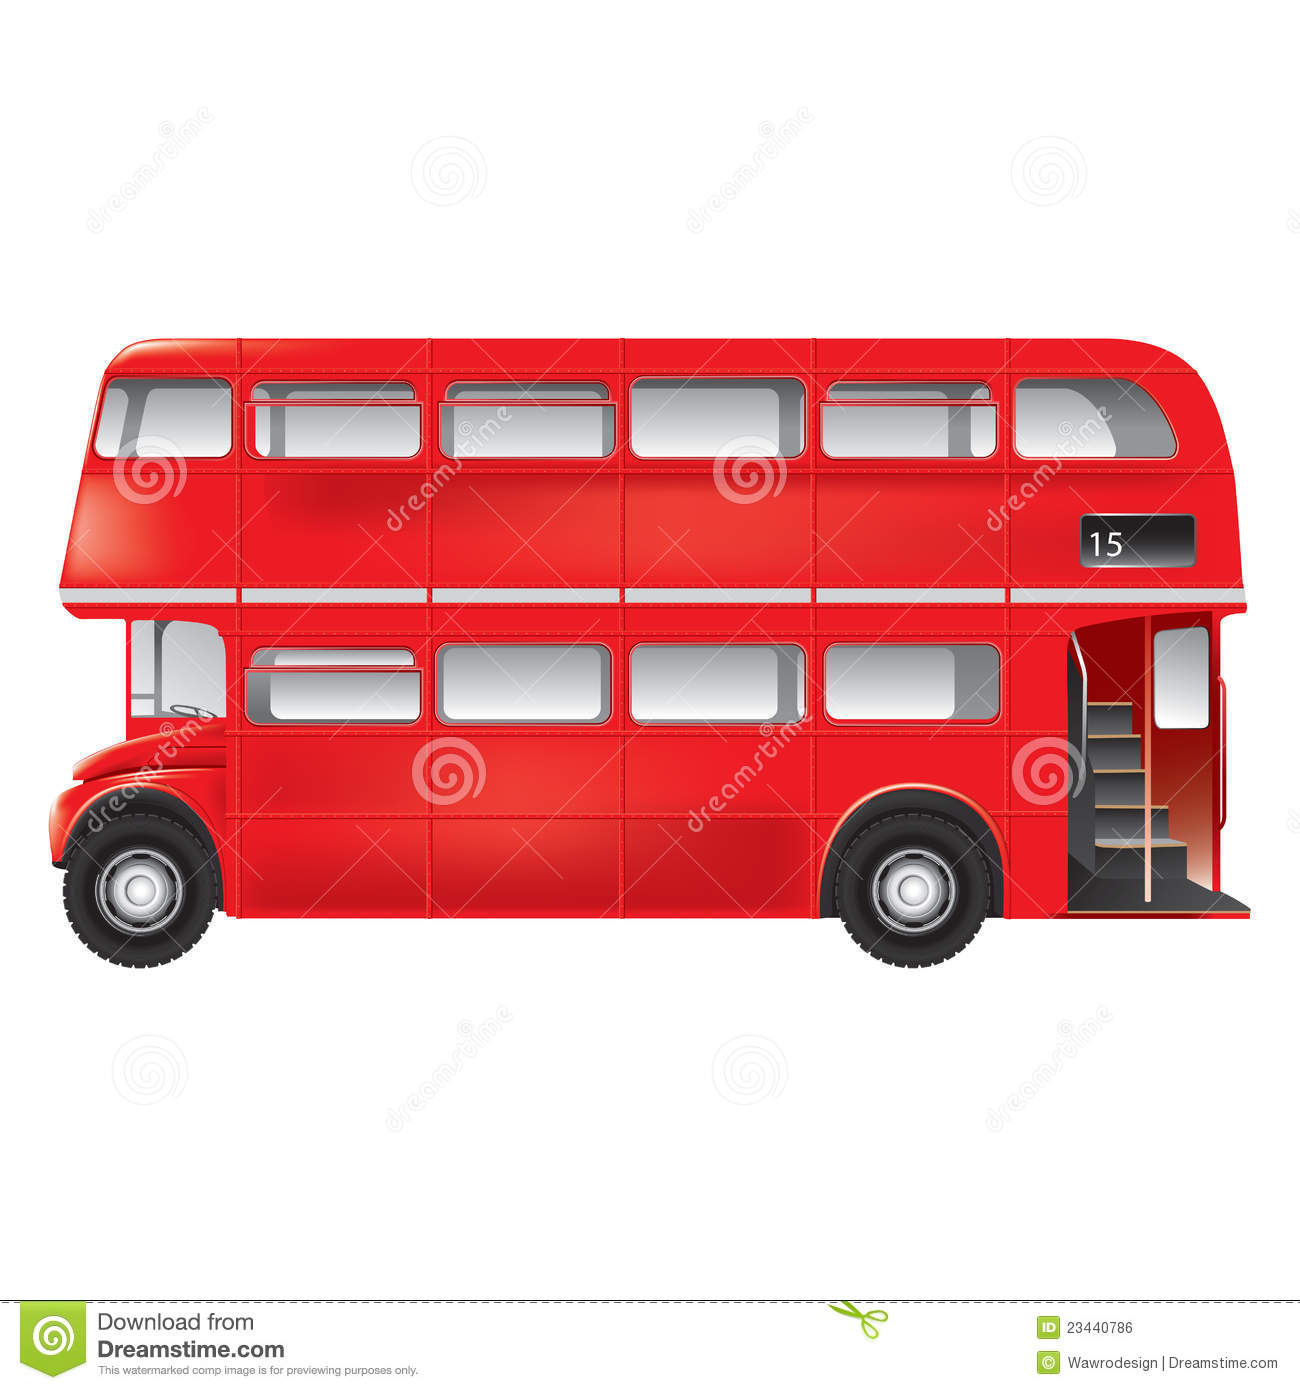 London bus clipart clipart suggest for Clipart bus